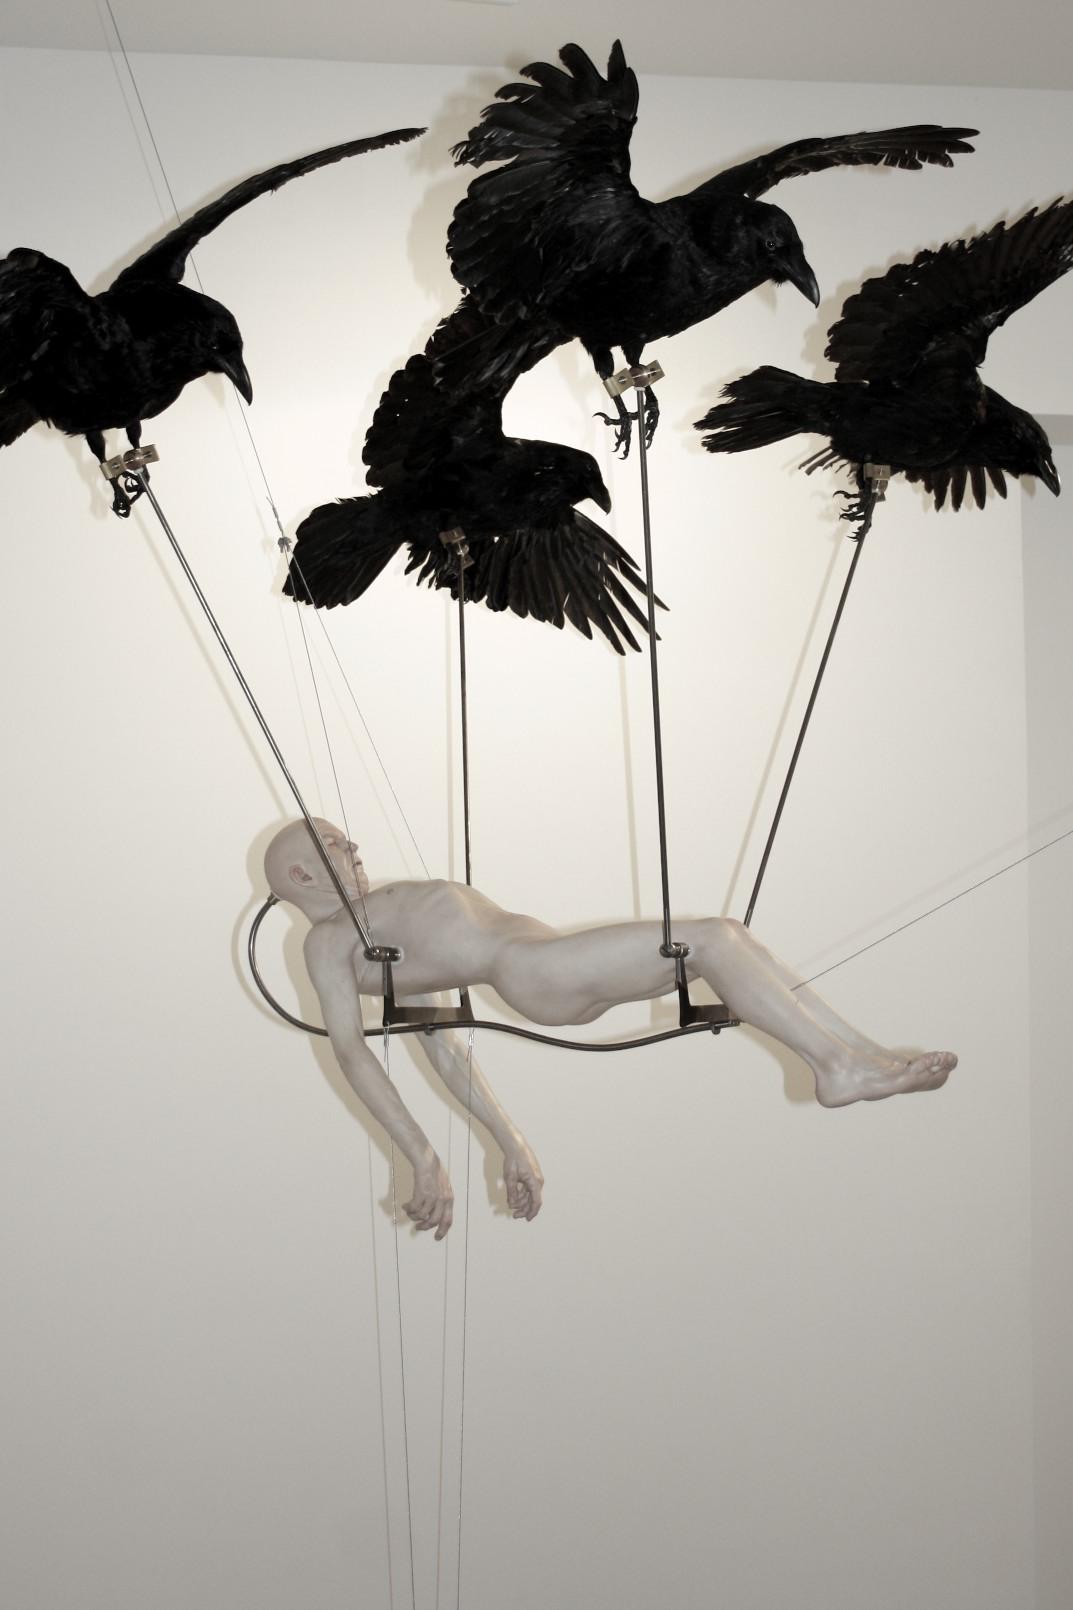 Leaving Gravity – Christian-Pontus Andersson